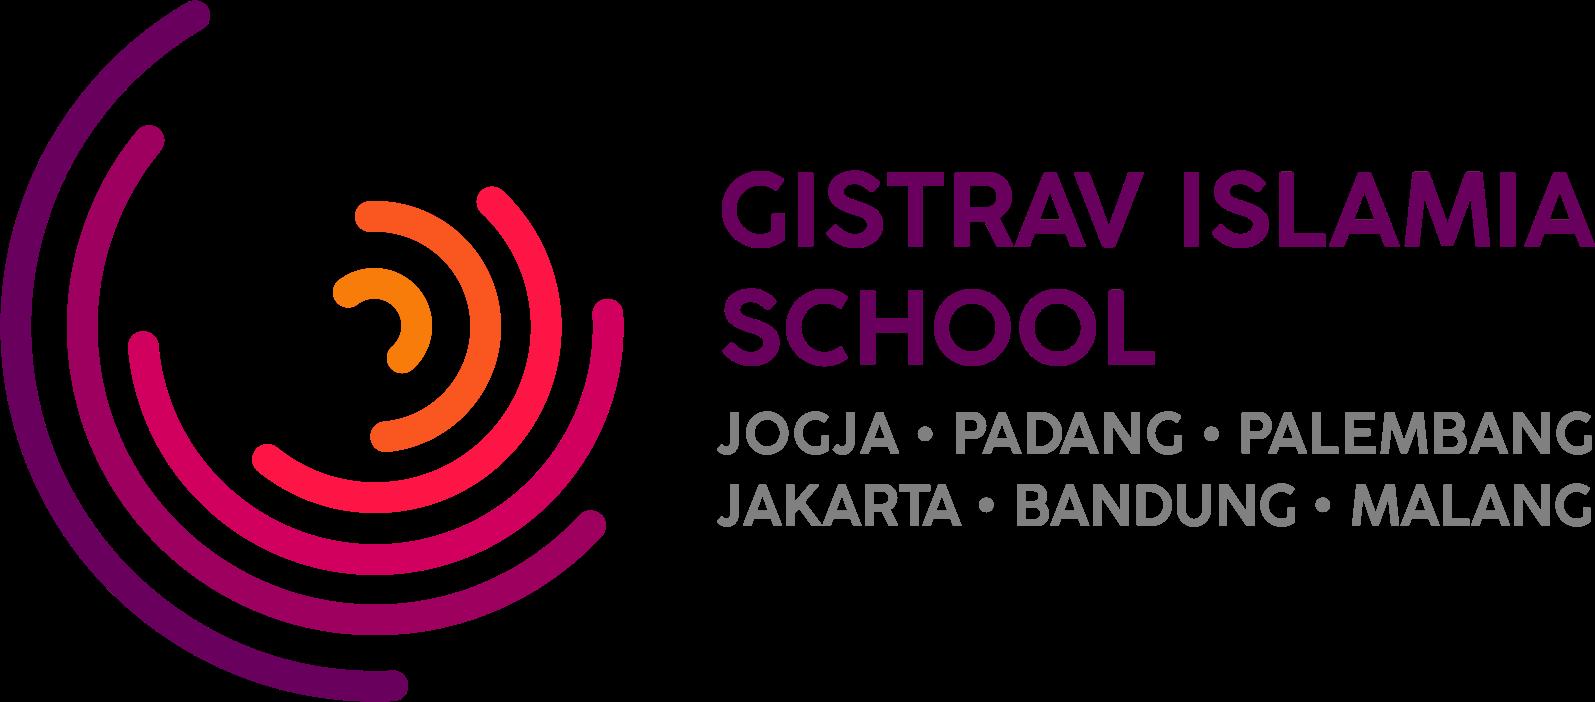 Gistrav Islamic School | GIS